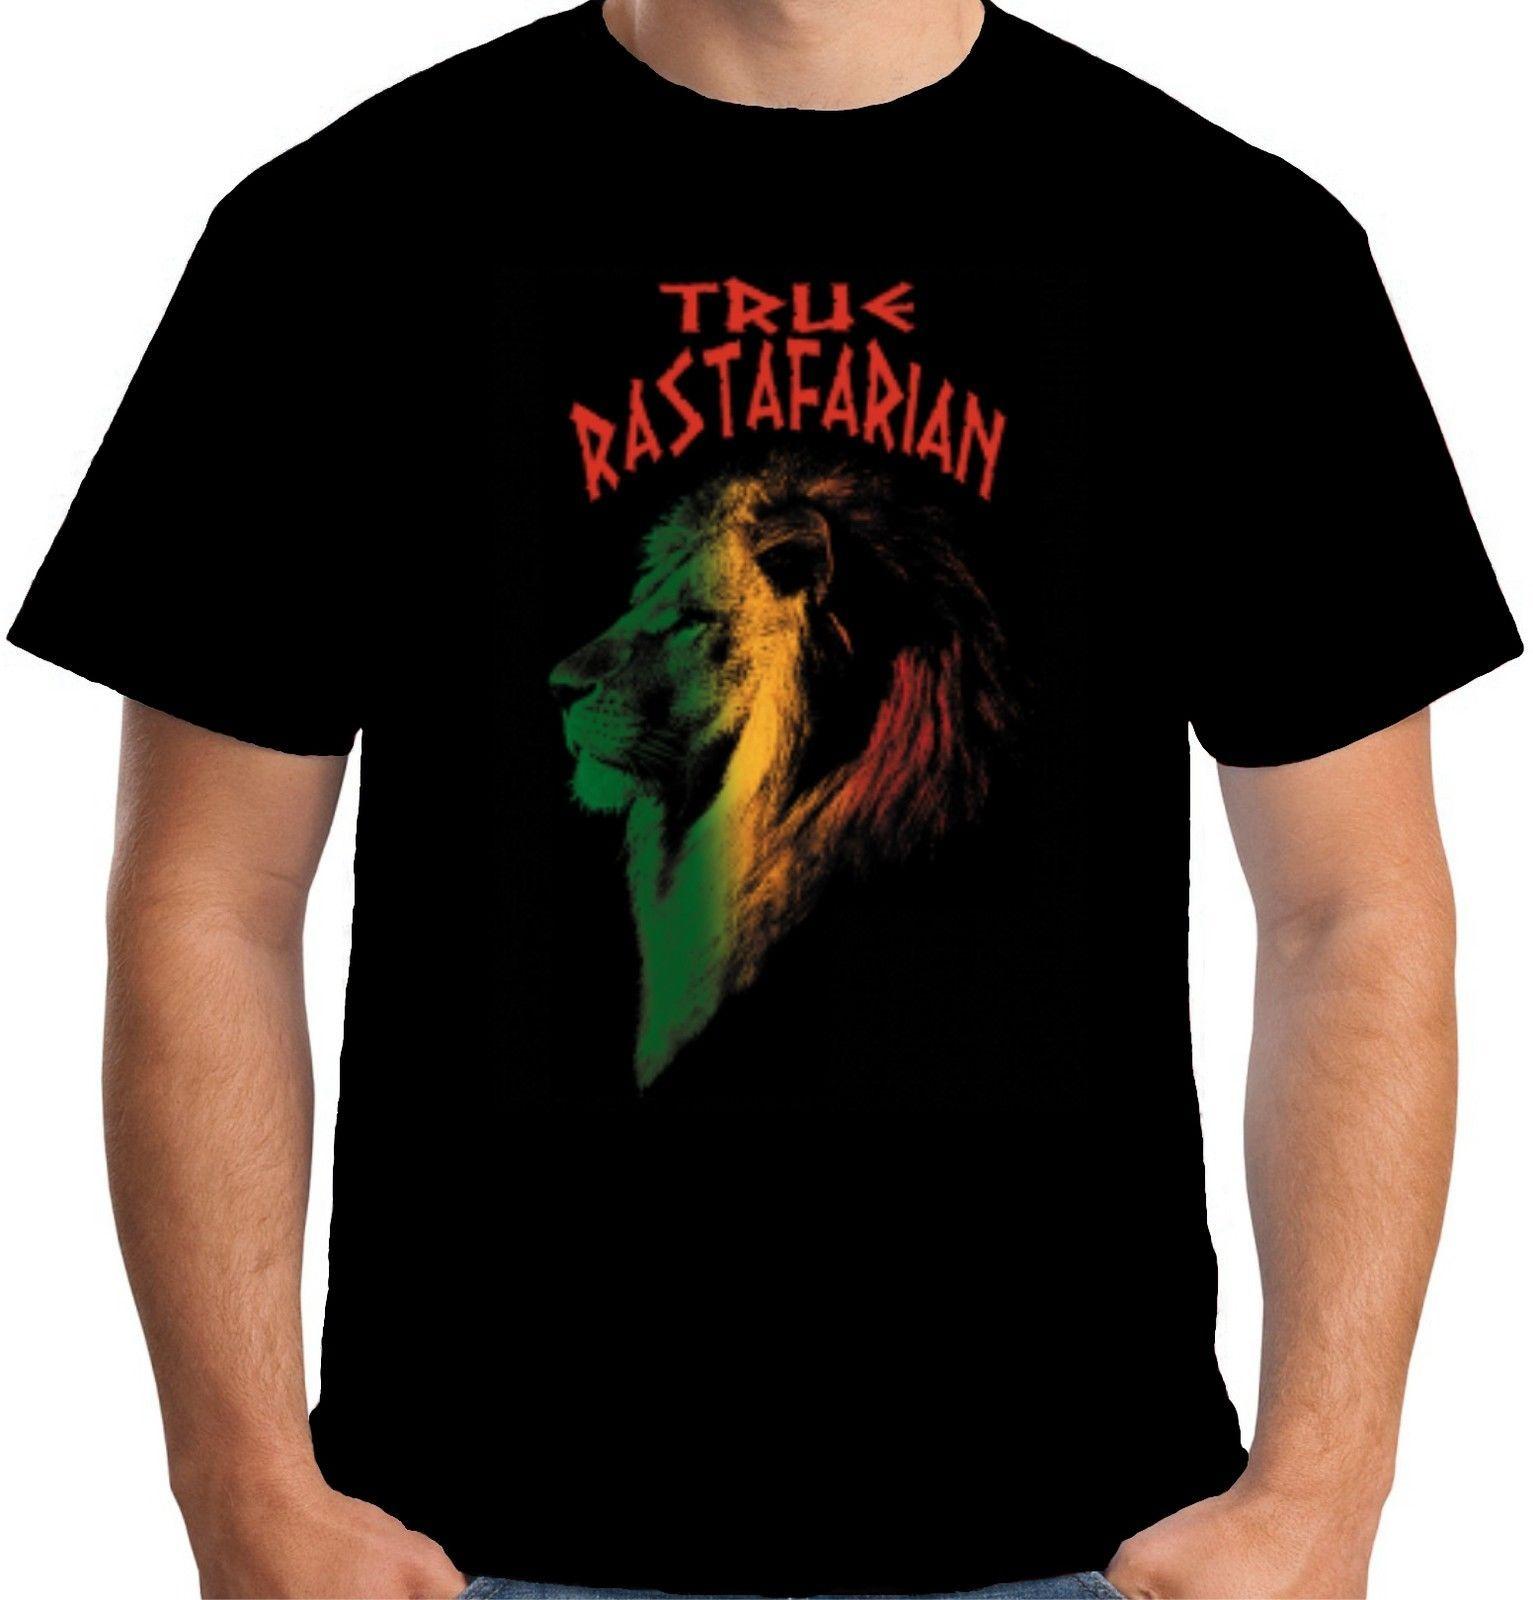 e5bbca3e47e Velocitee Mens True Rastafarian Lion T Shirt Rasta Cool Marley Reggae  W15183 Online with  15.56 Piece on Futuretshirts s Store